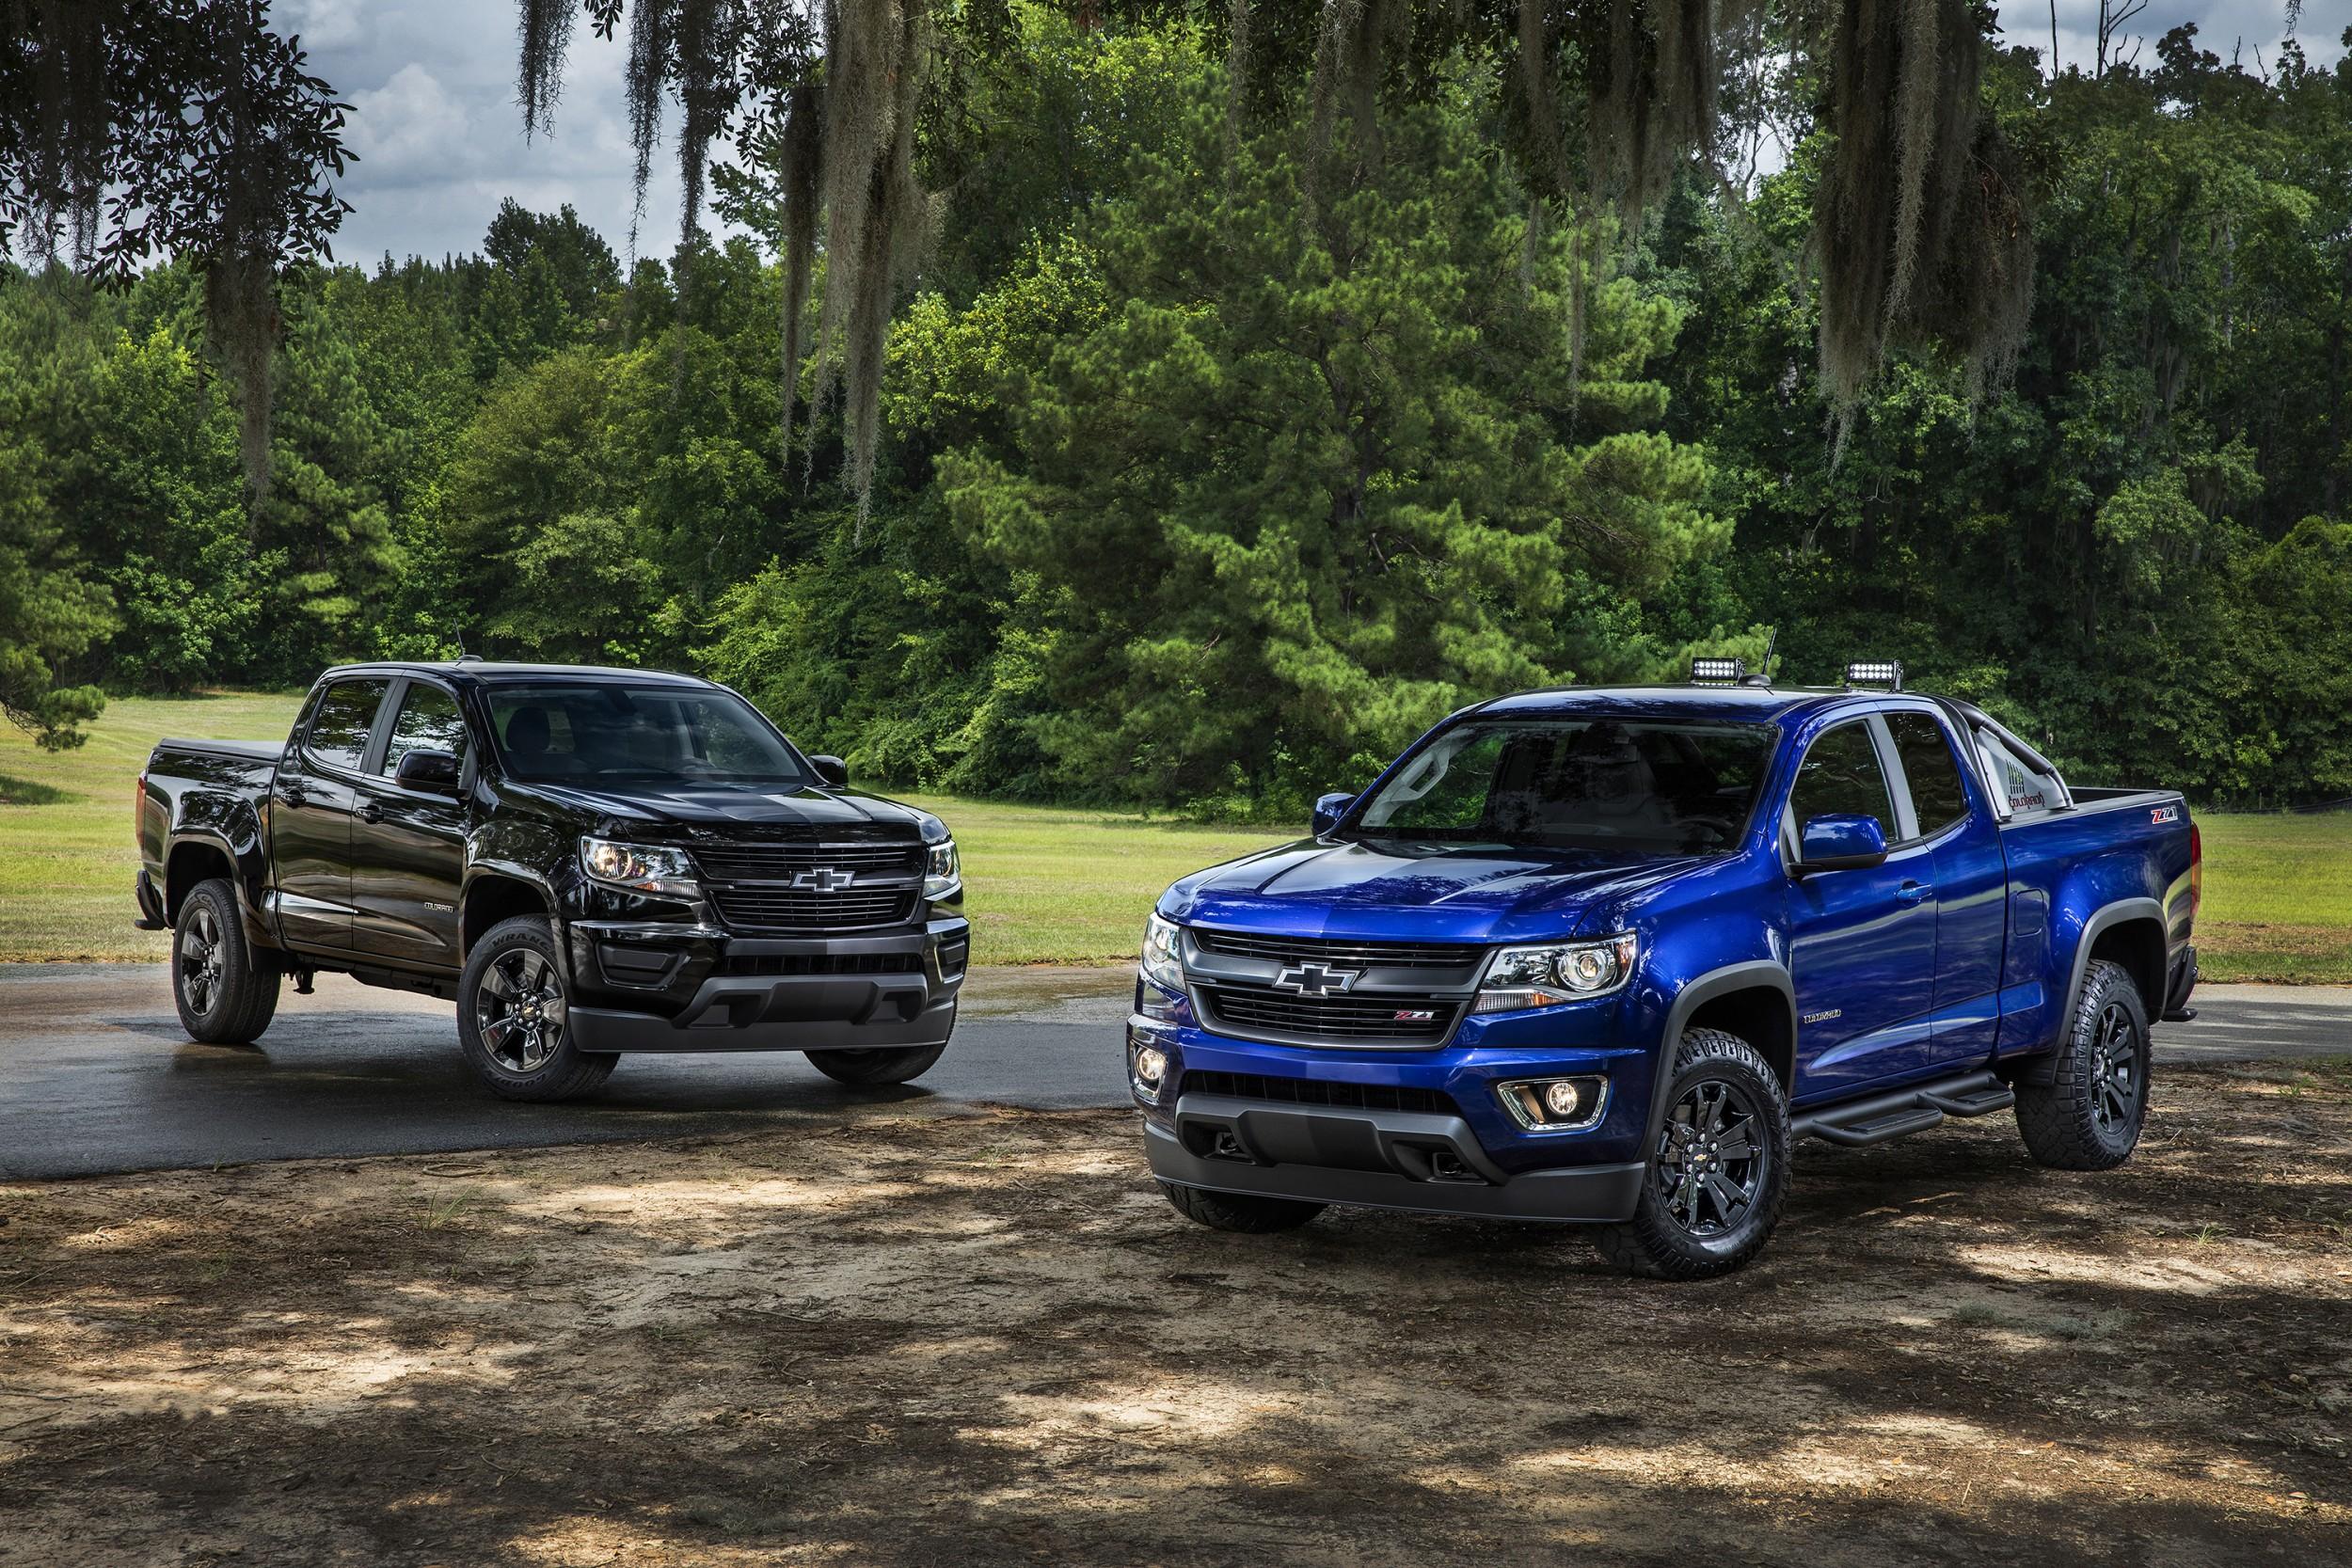 Chevy Announces Two Special Edition Colorado Models • AutoTalk